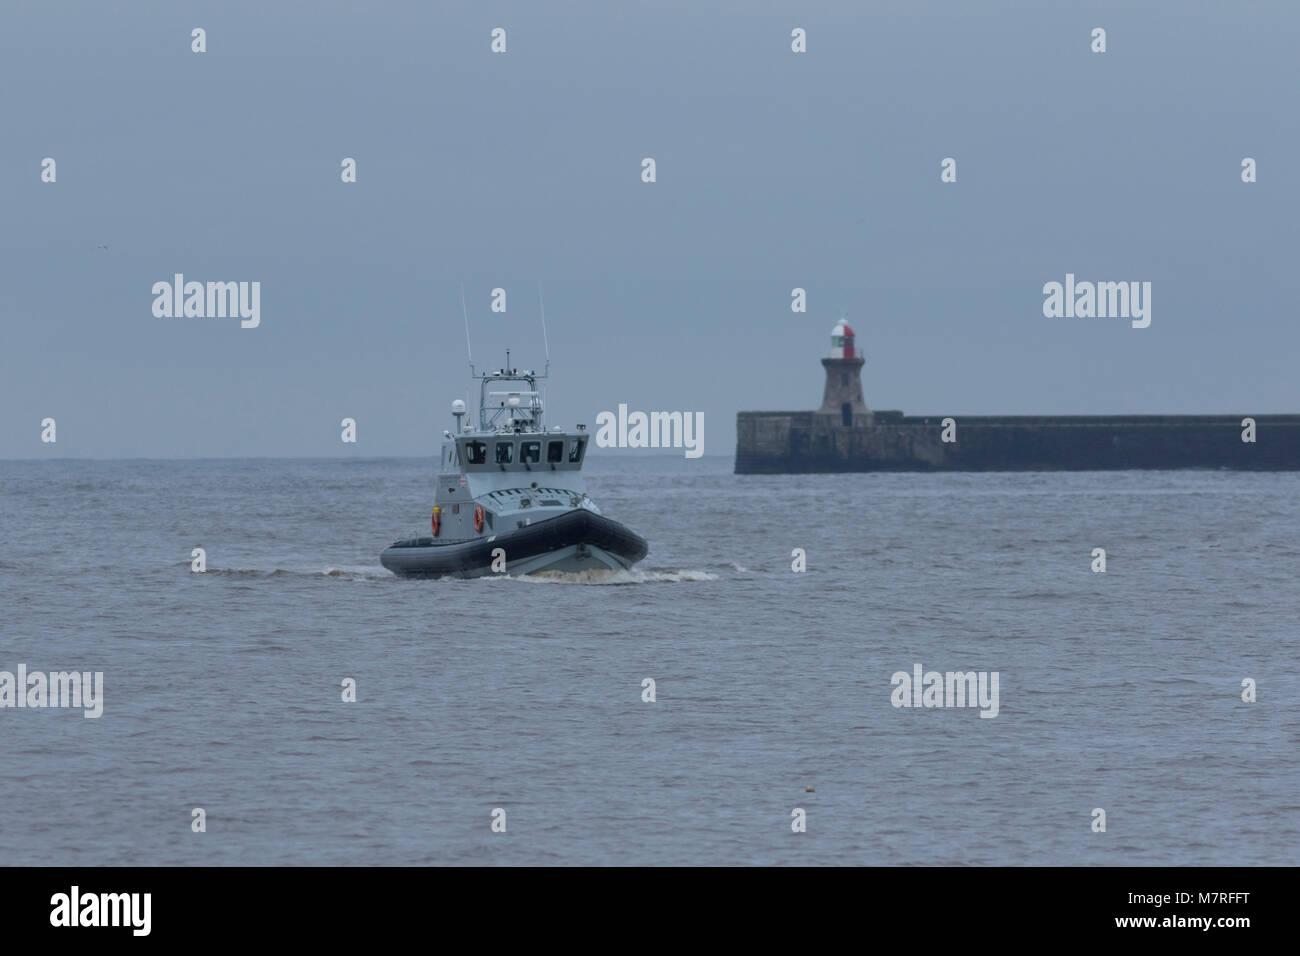 Border patrol vessel Alert - Stock Image